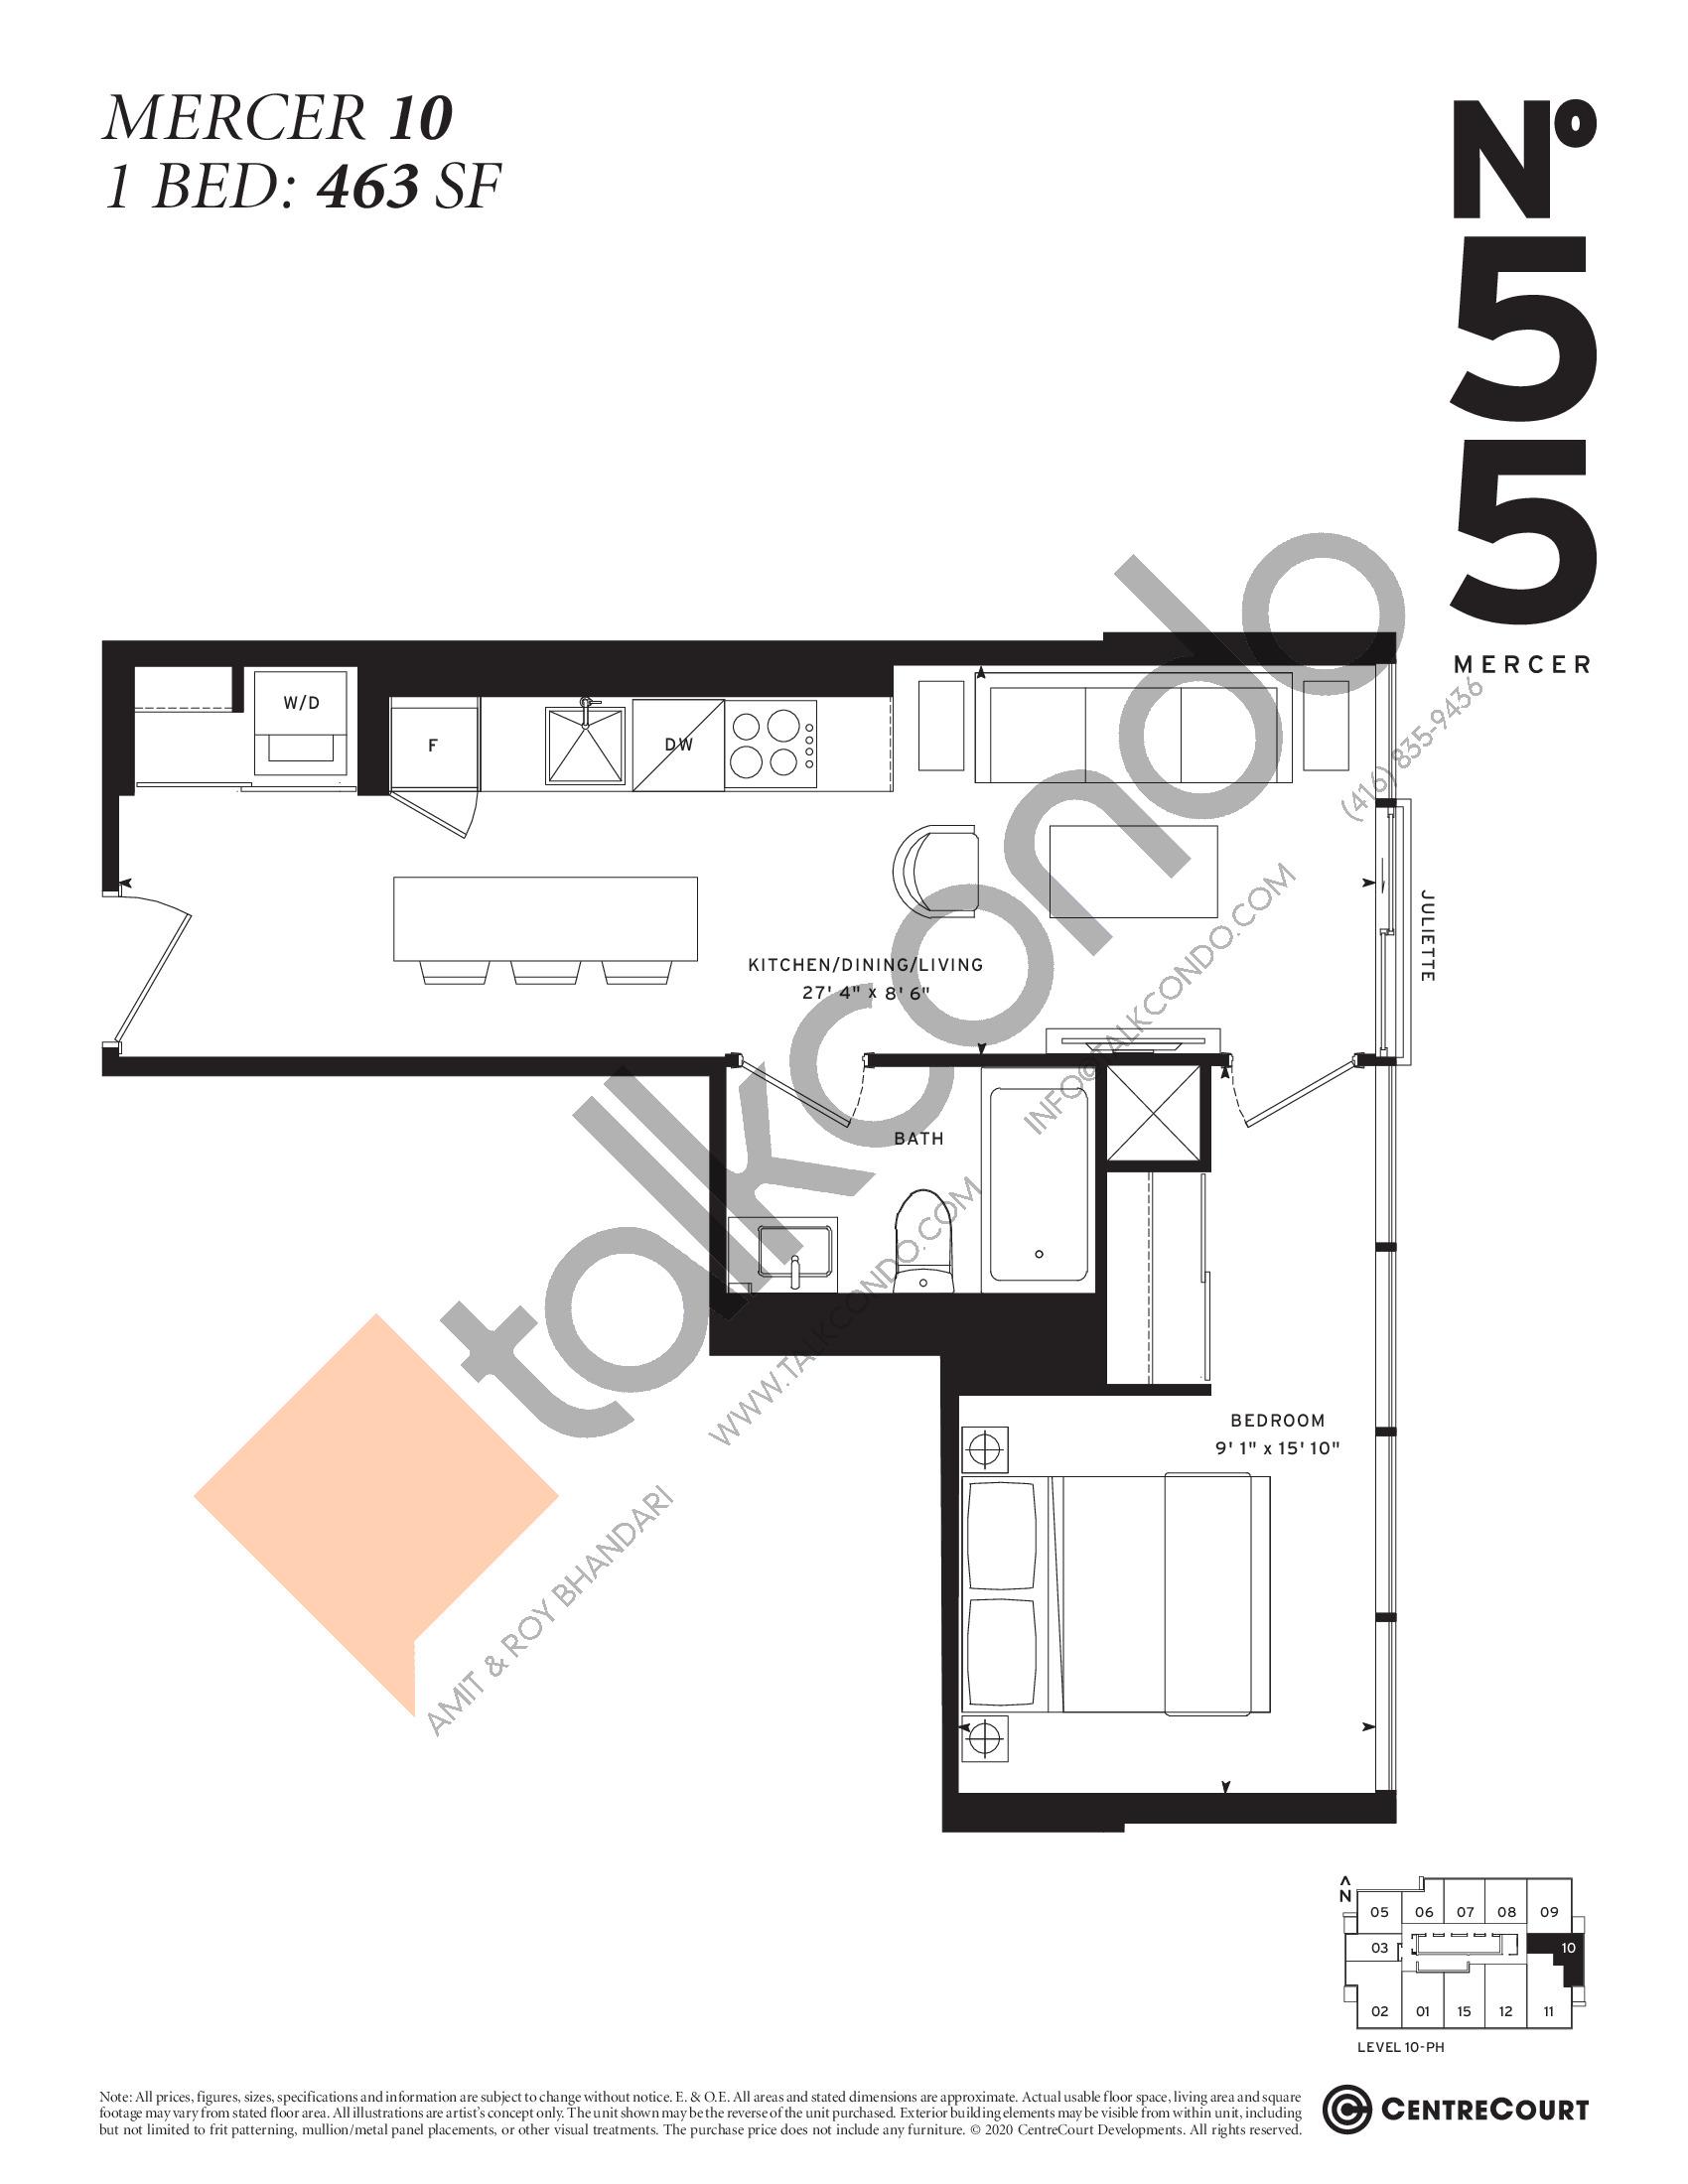 Mercer 10 Floor Plan at No. 55 Mercer Condos - 463 sq.ft